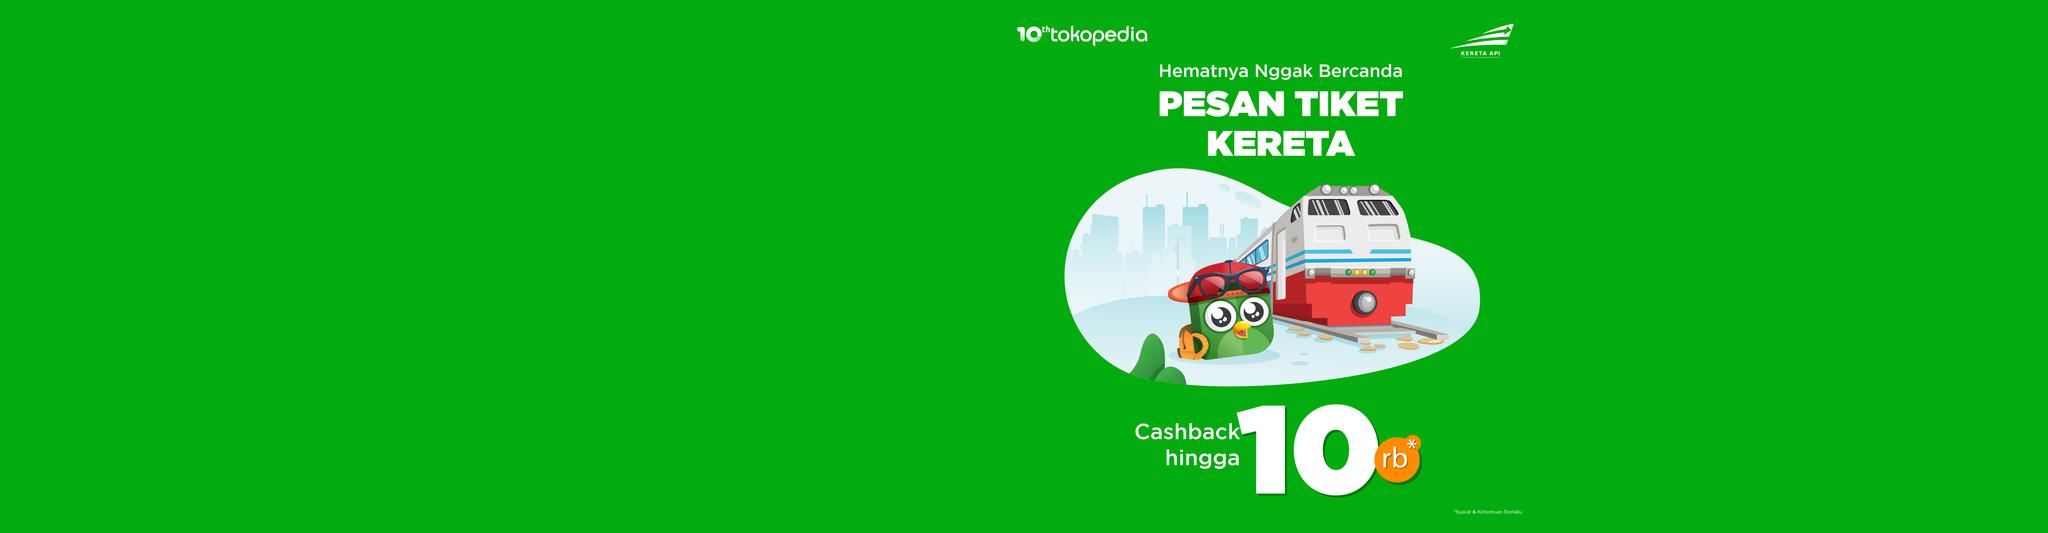 Hematnya Gak Bercanda! Dapatkan cashback 10rb pesan tiket kereta dengan KAI Pass. Beli vouchernya di sini yuk!